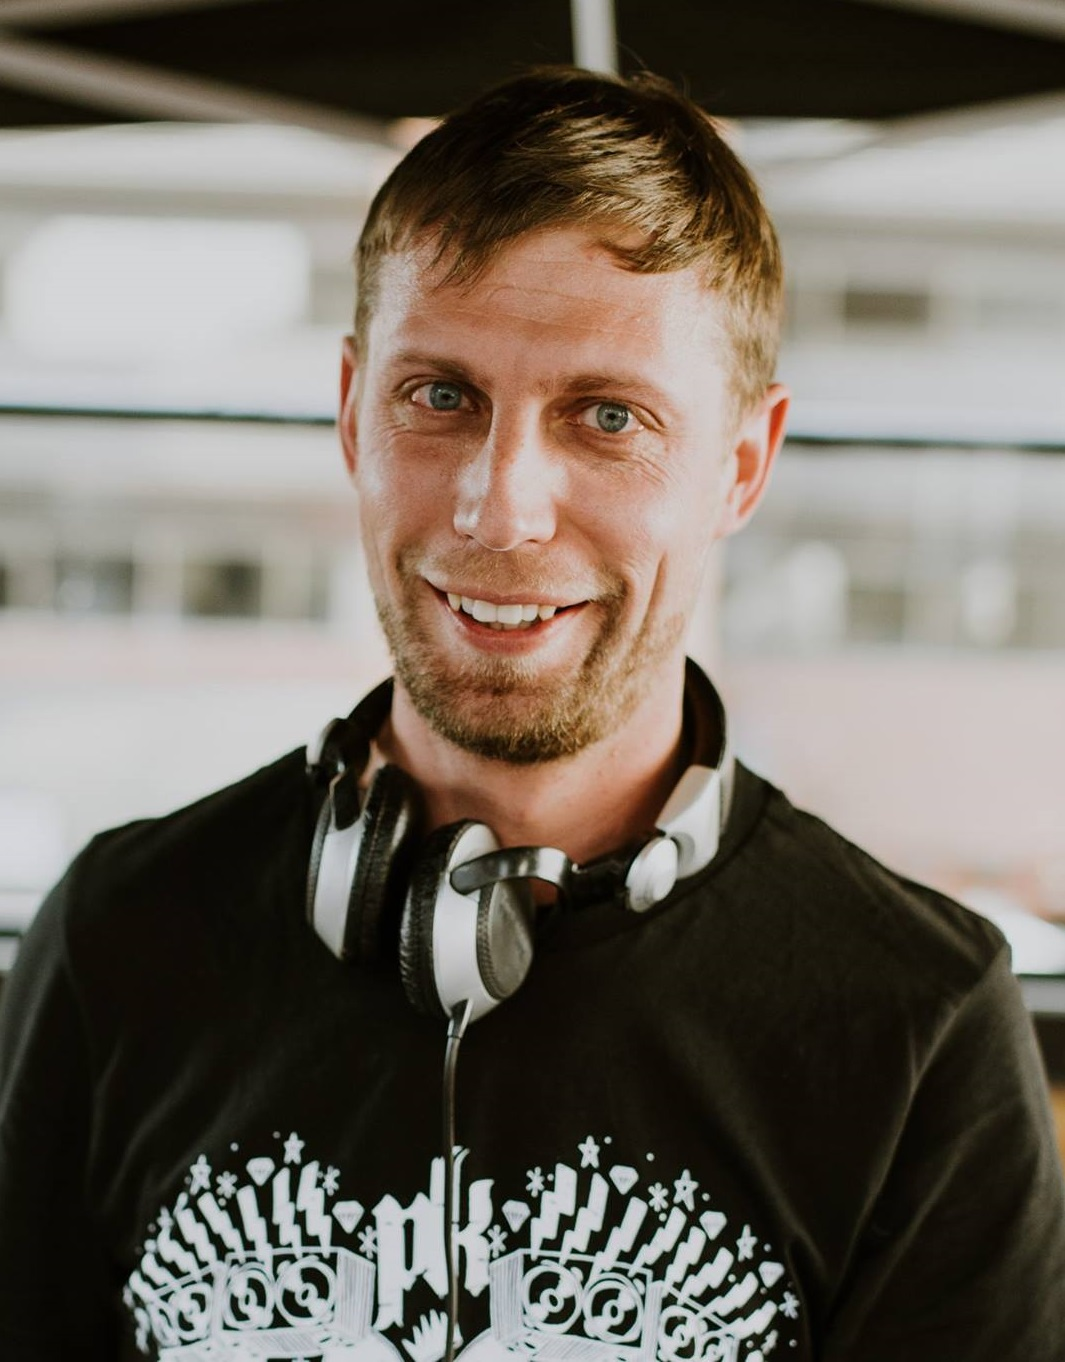 Arlen Cormack, PK Sound